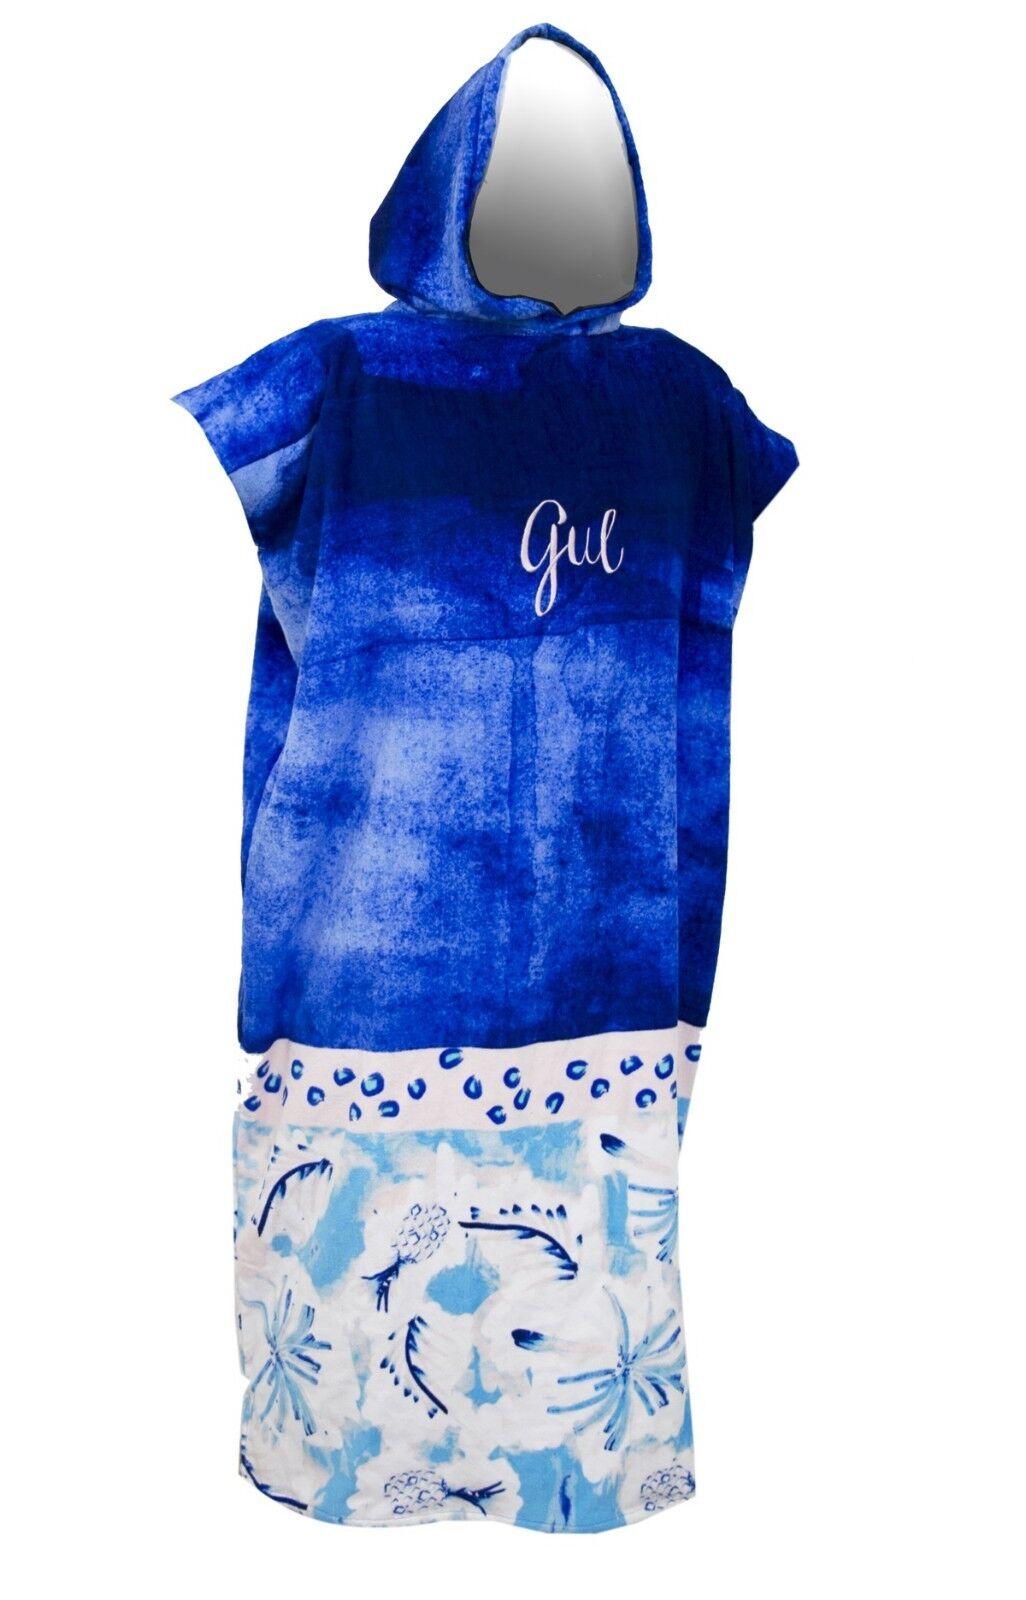 GUL 2019 CHANGING PONCHO TOWEL HOODED ROBE UNISEX SUMMER BEACH blueE PINEAPPLE